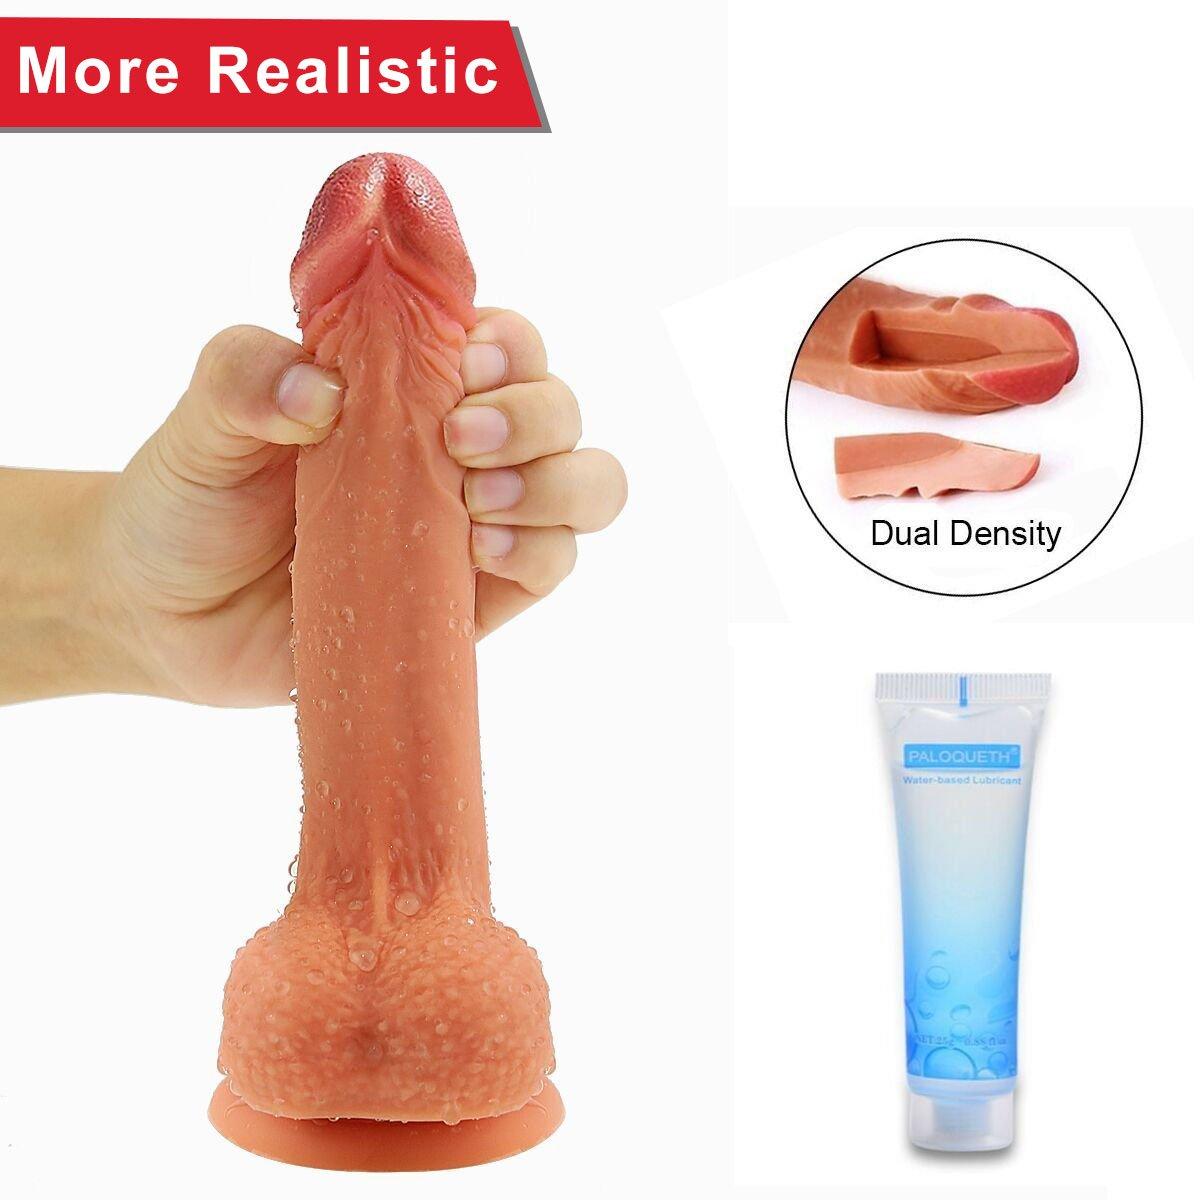 Real latina masturbation to orgasm